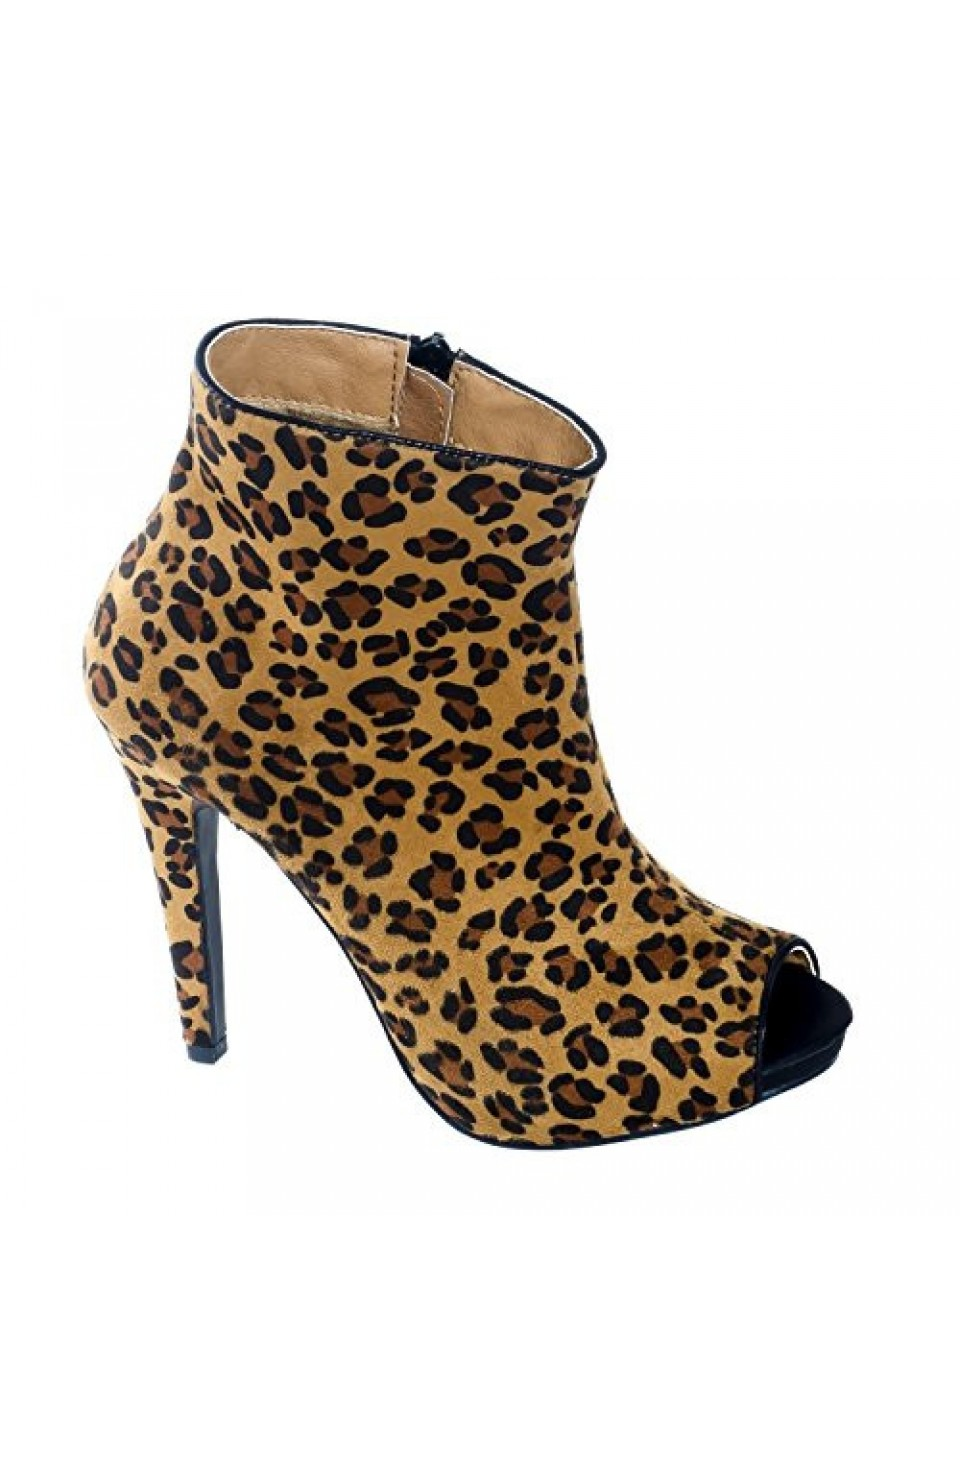 Women's Leopard Marcoo Manmade Zip-up Stiletto Bootie